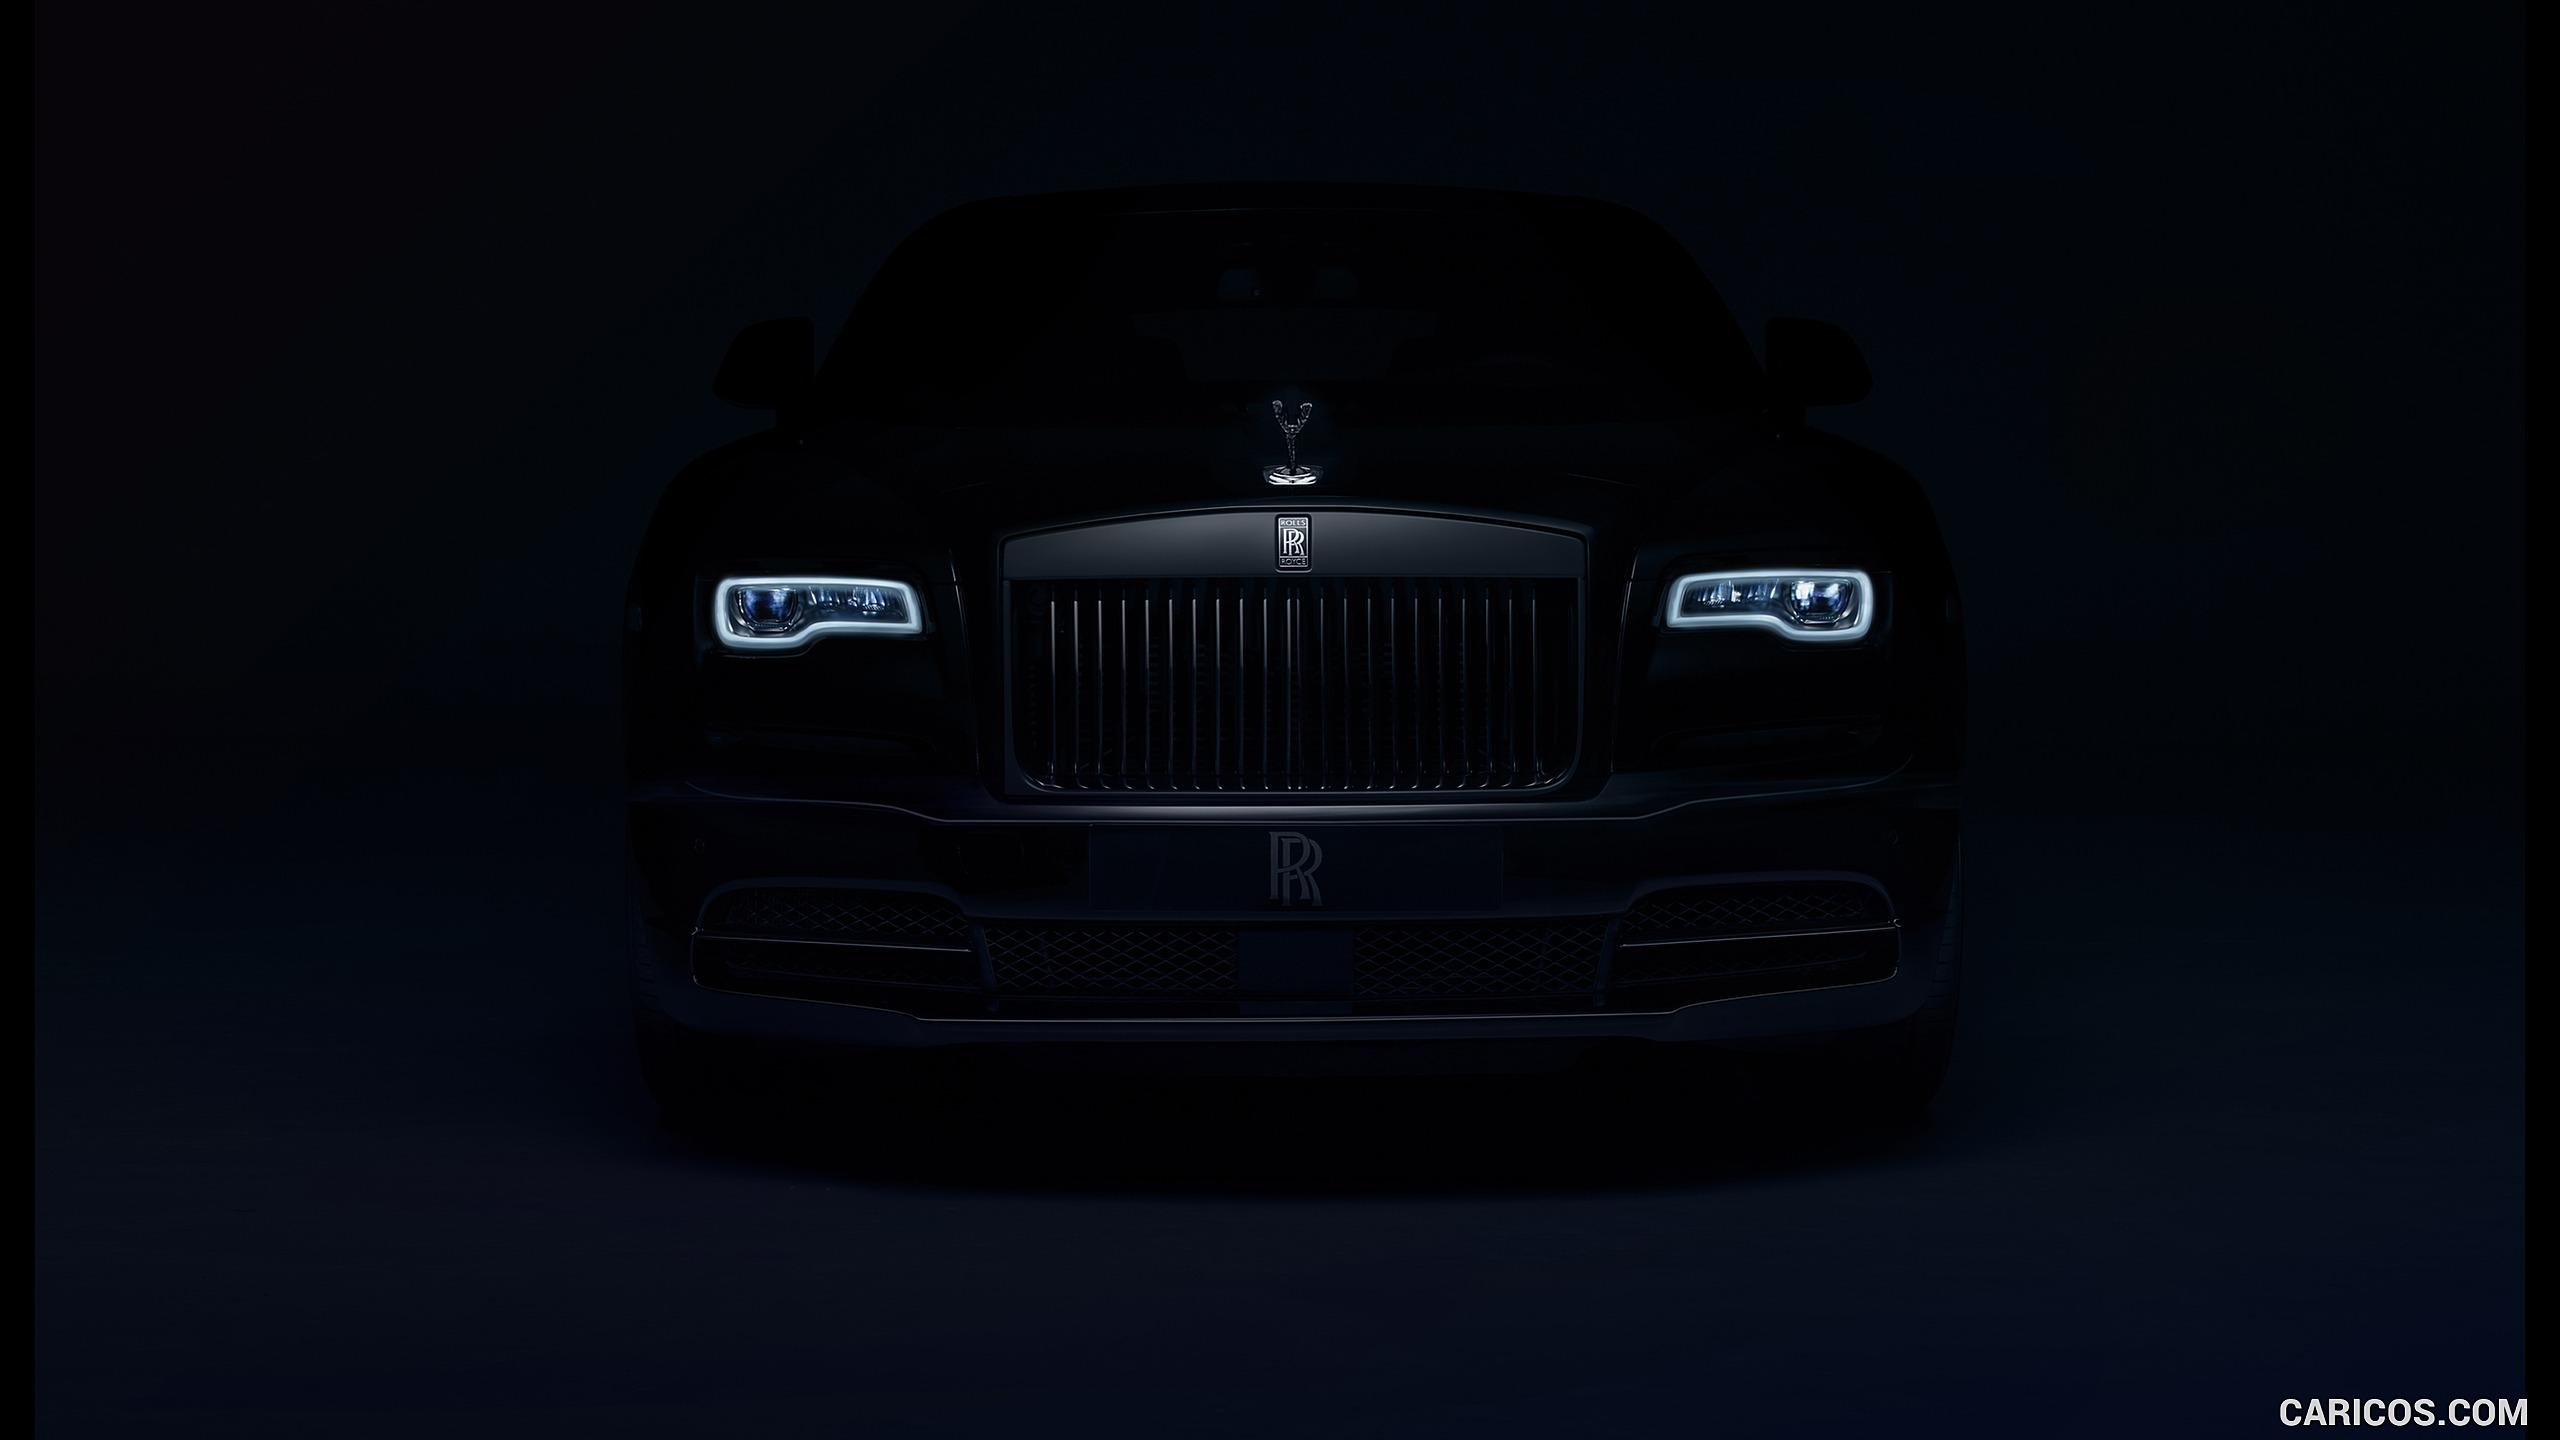 87 Rolls Royce Logo Wallpapers On Wallpapersafari